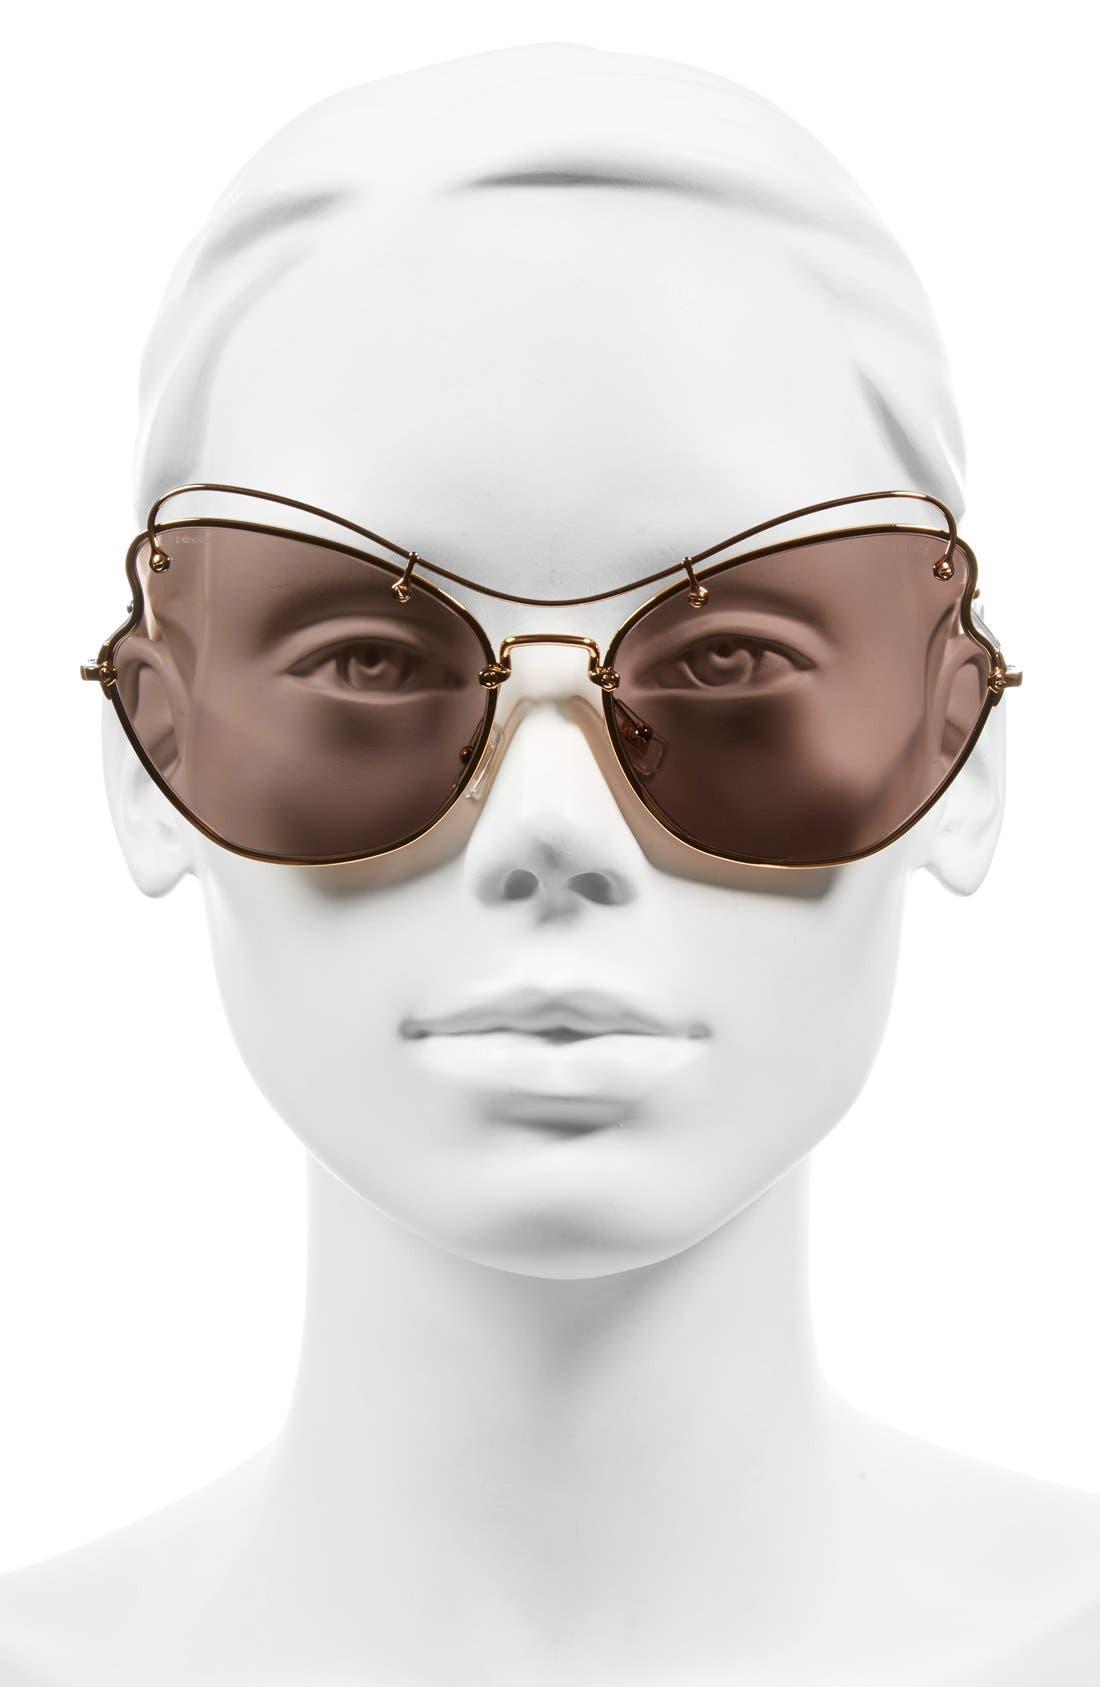 65mm Sunglasses,                             Alternate thumbnail 2, color,                             Light Purple